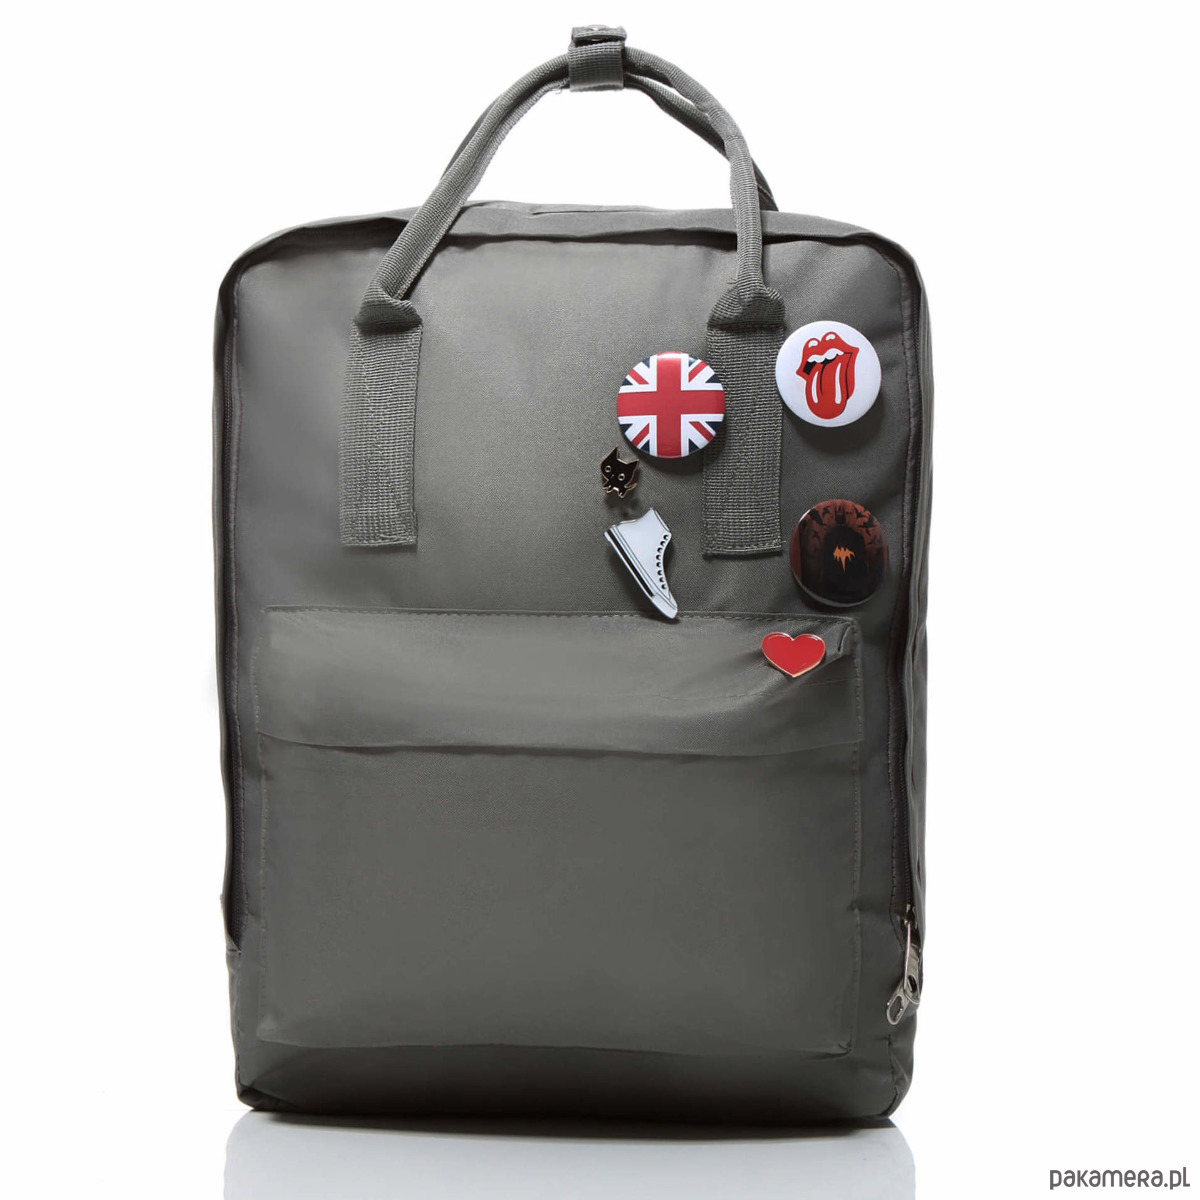 5580db32cab85 Plecak vintage damski materiałowy szary Baginc - plecaki - Pakamera.pl